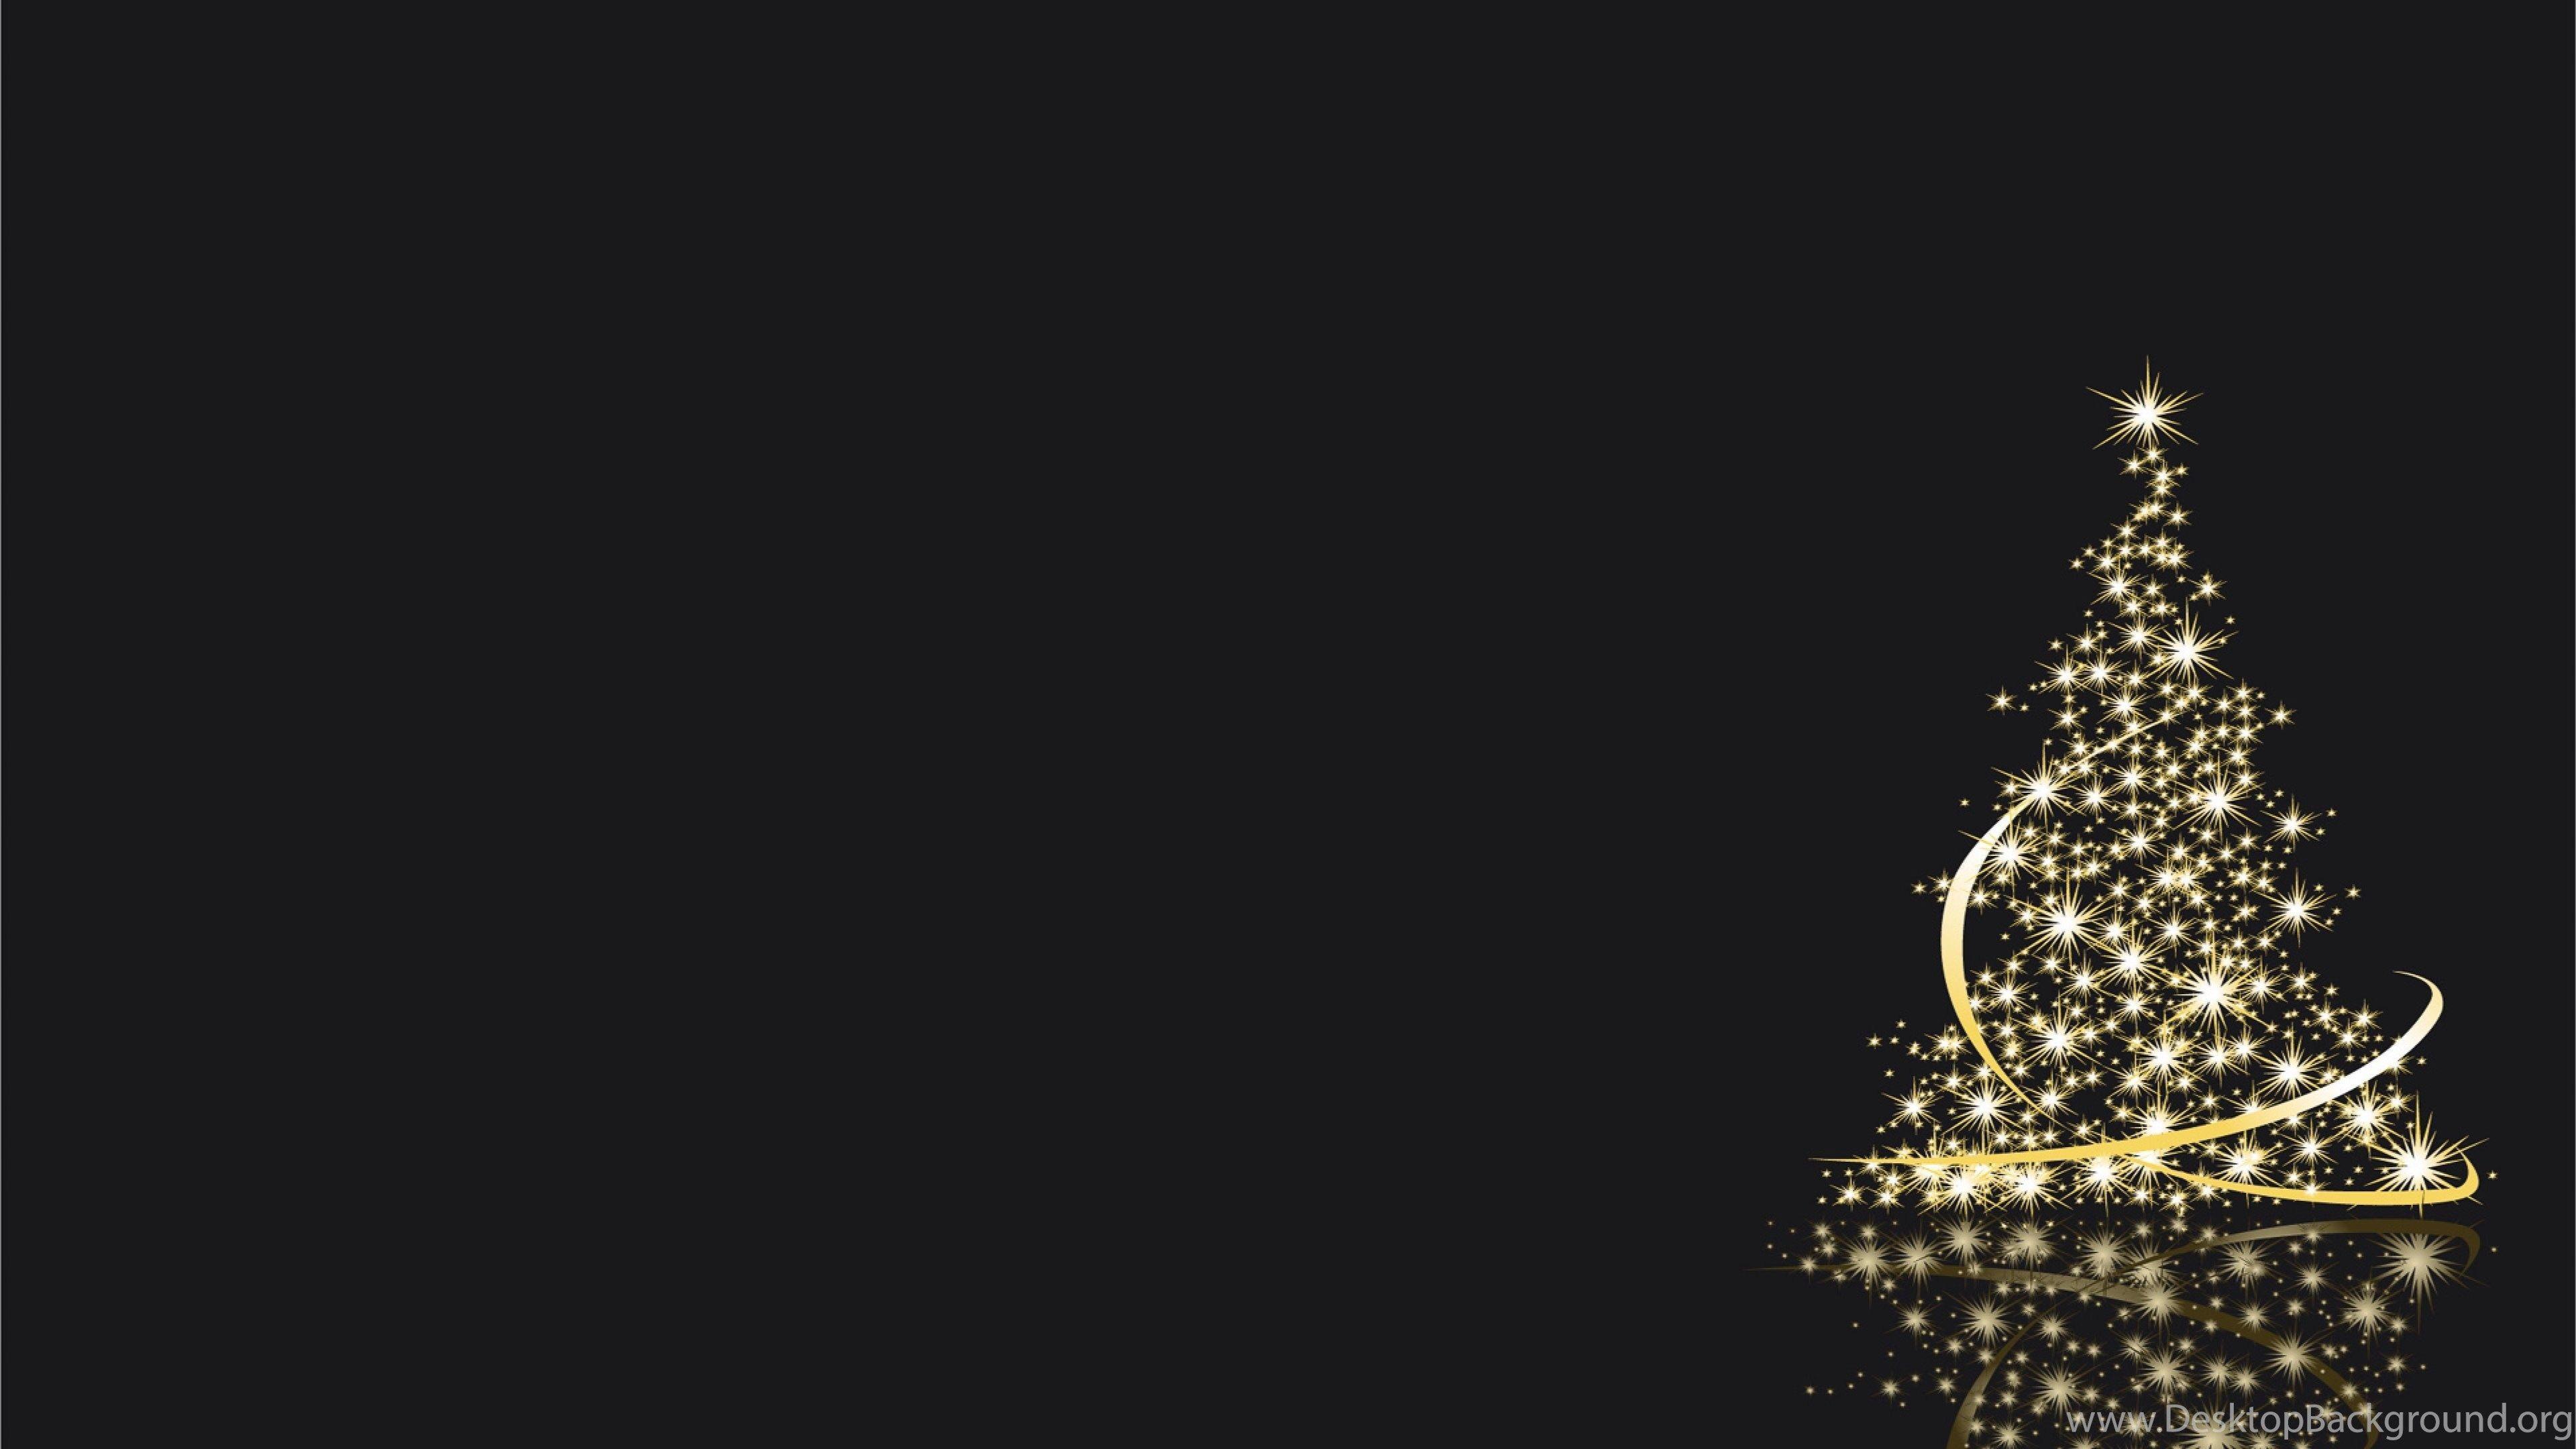 3840 X 2160 Christmas Wallpapers , Top Free 3840 X 2160